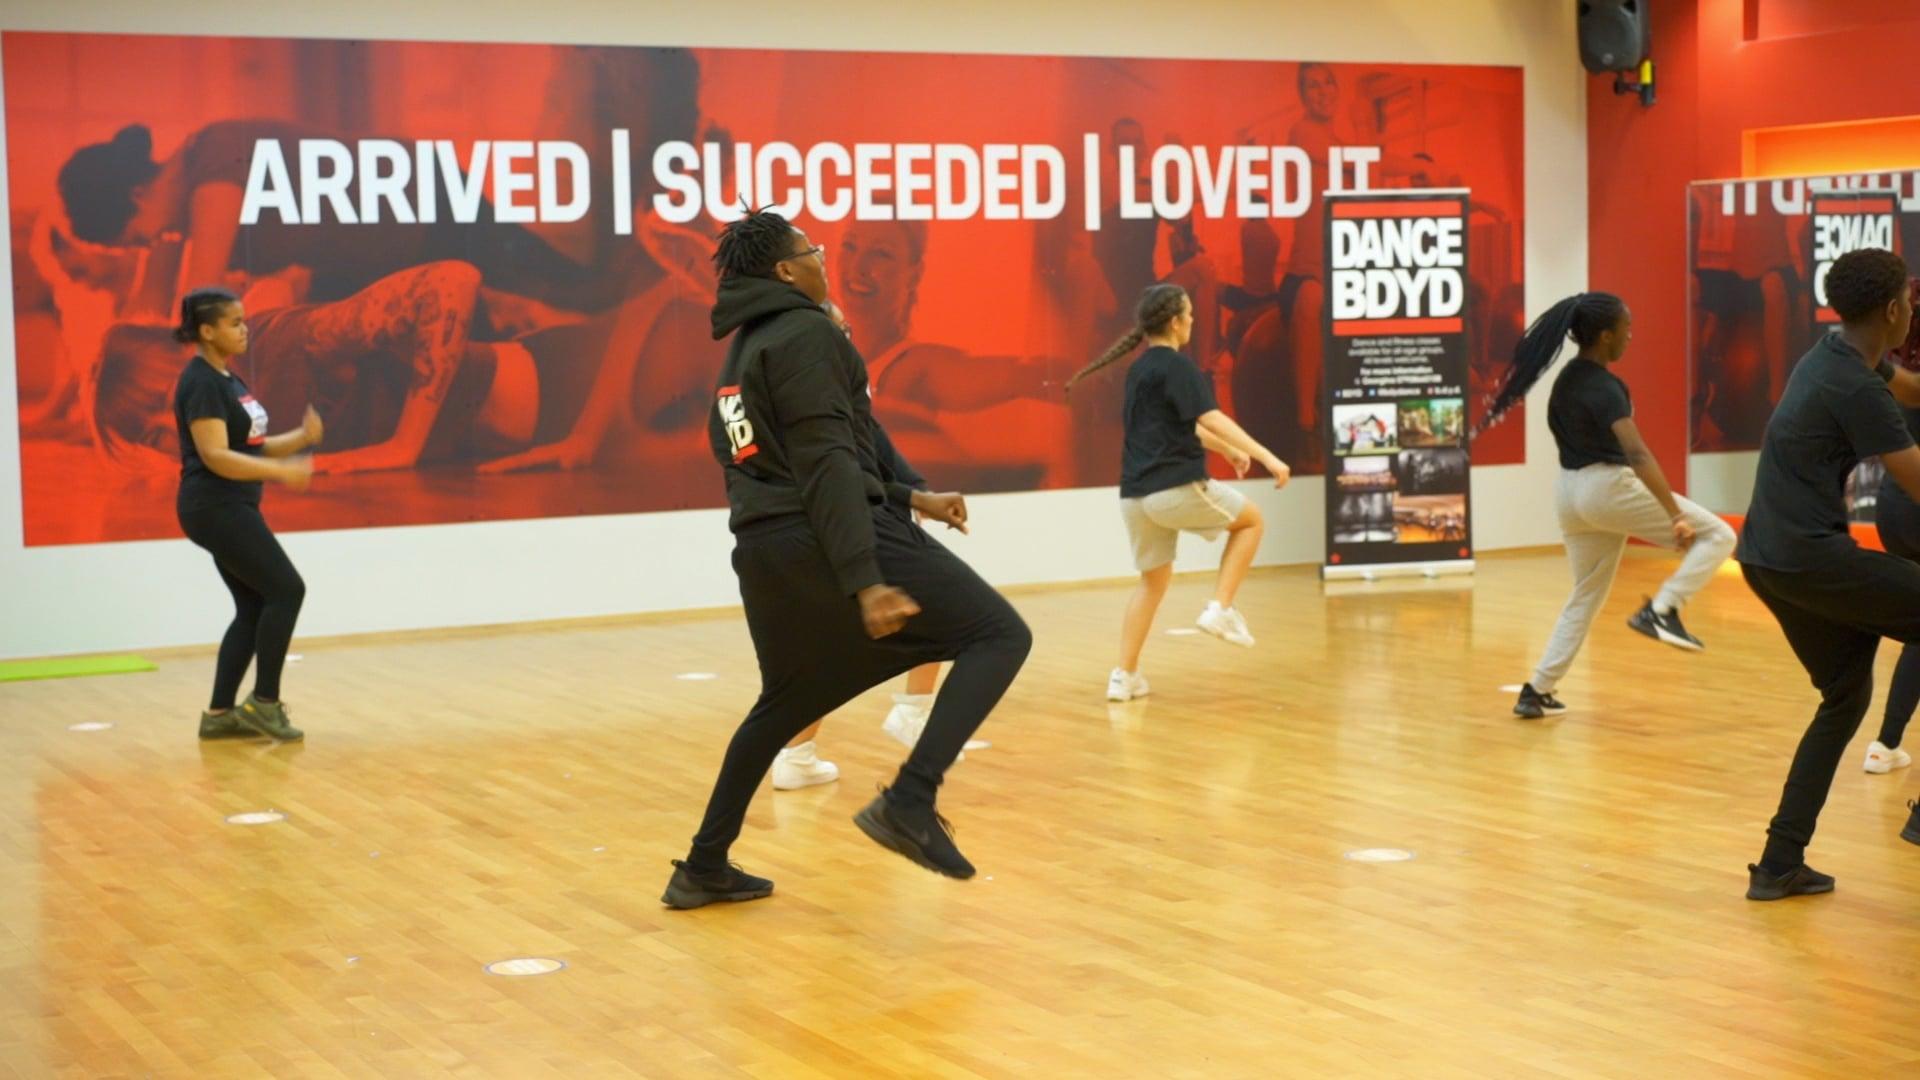 Barking & Dagenham Youth Dance' Street Dance Fitness project